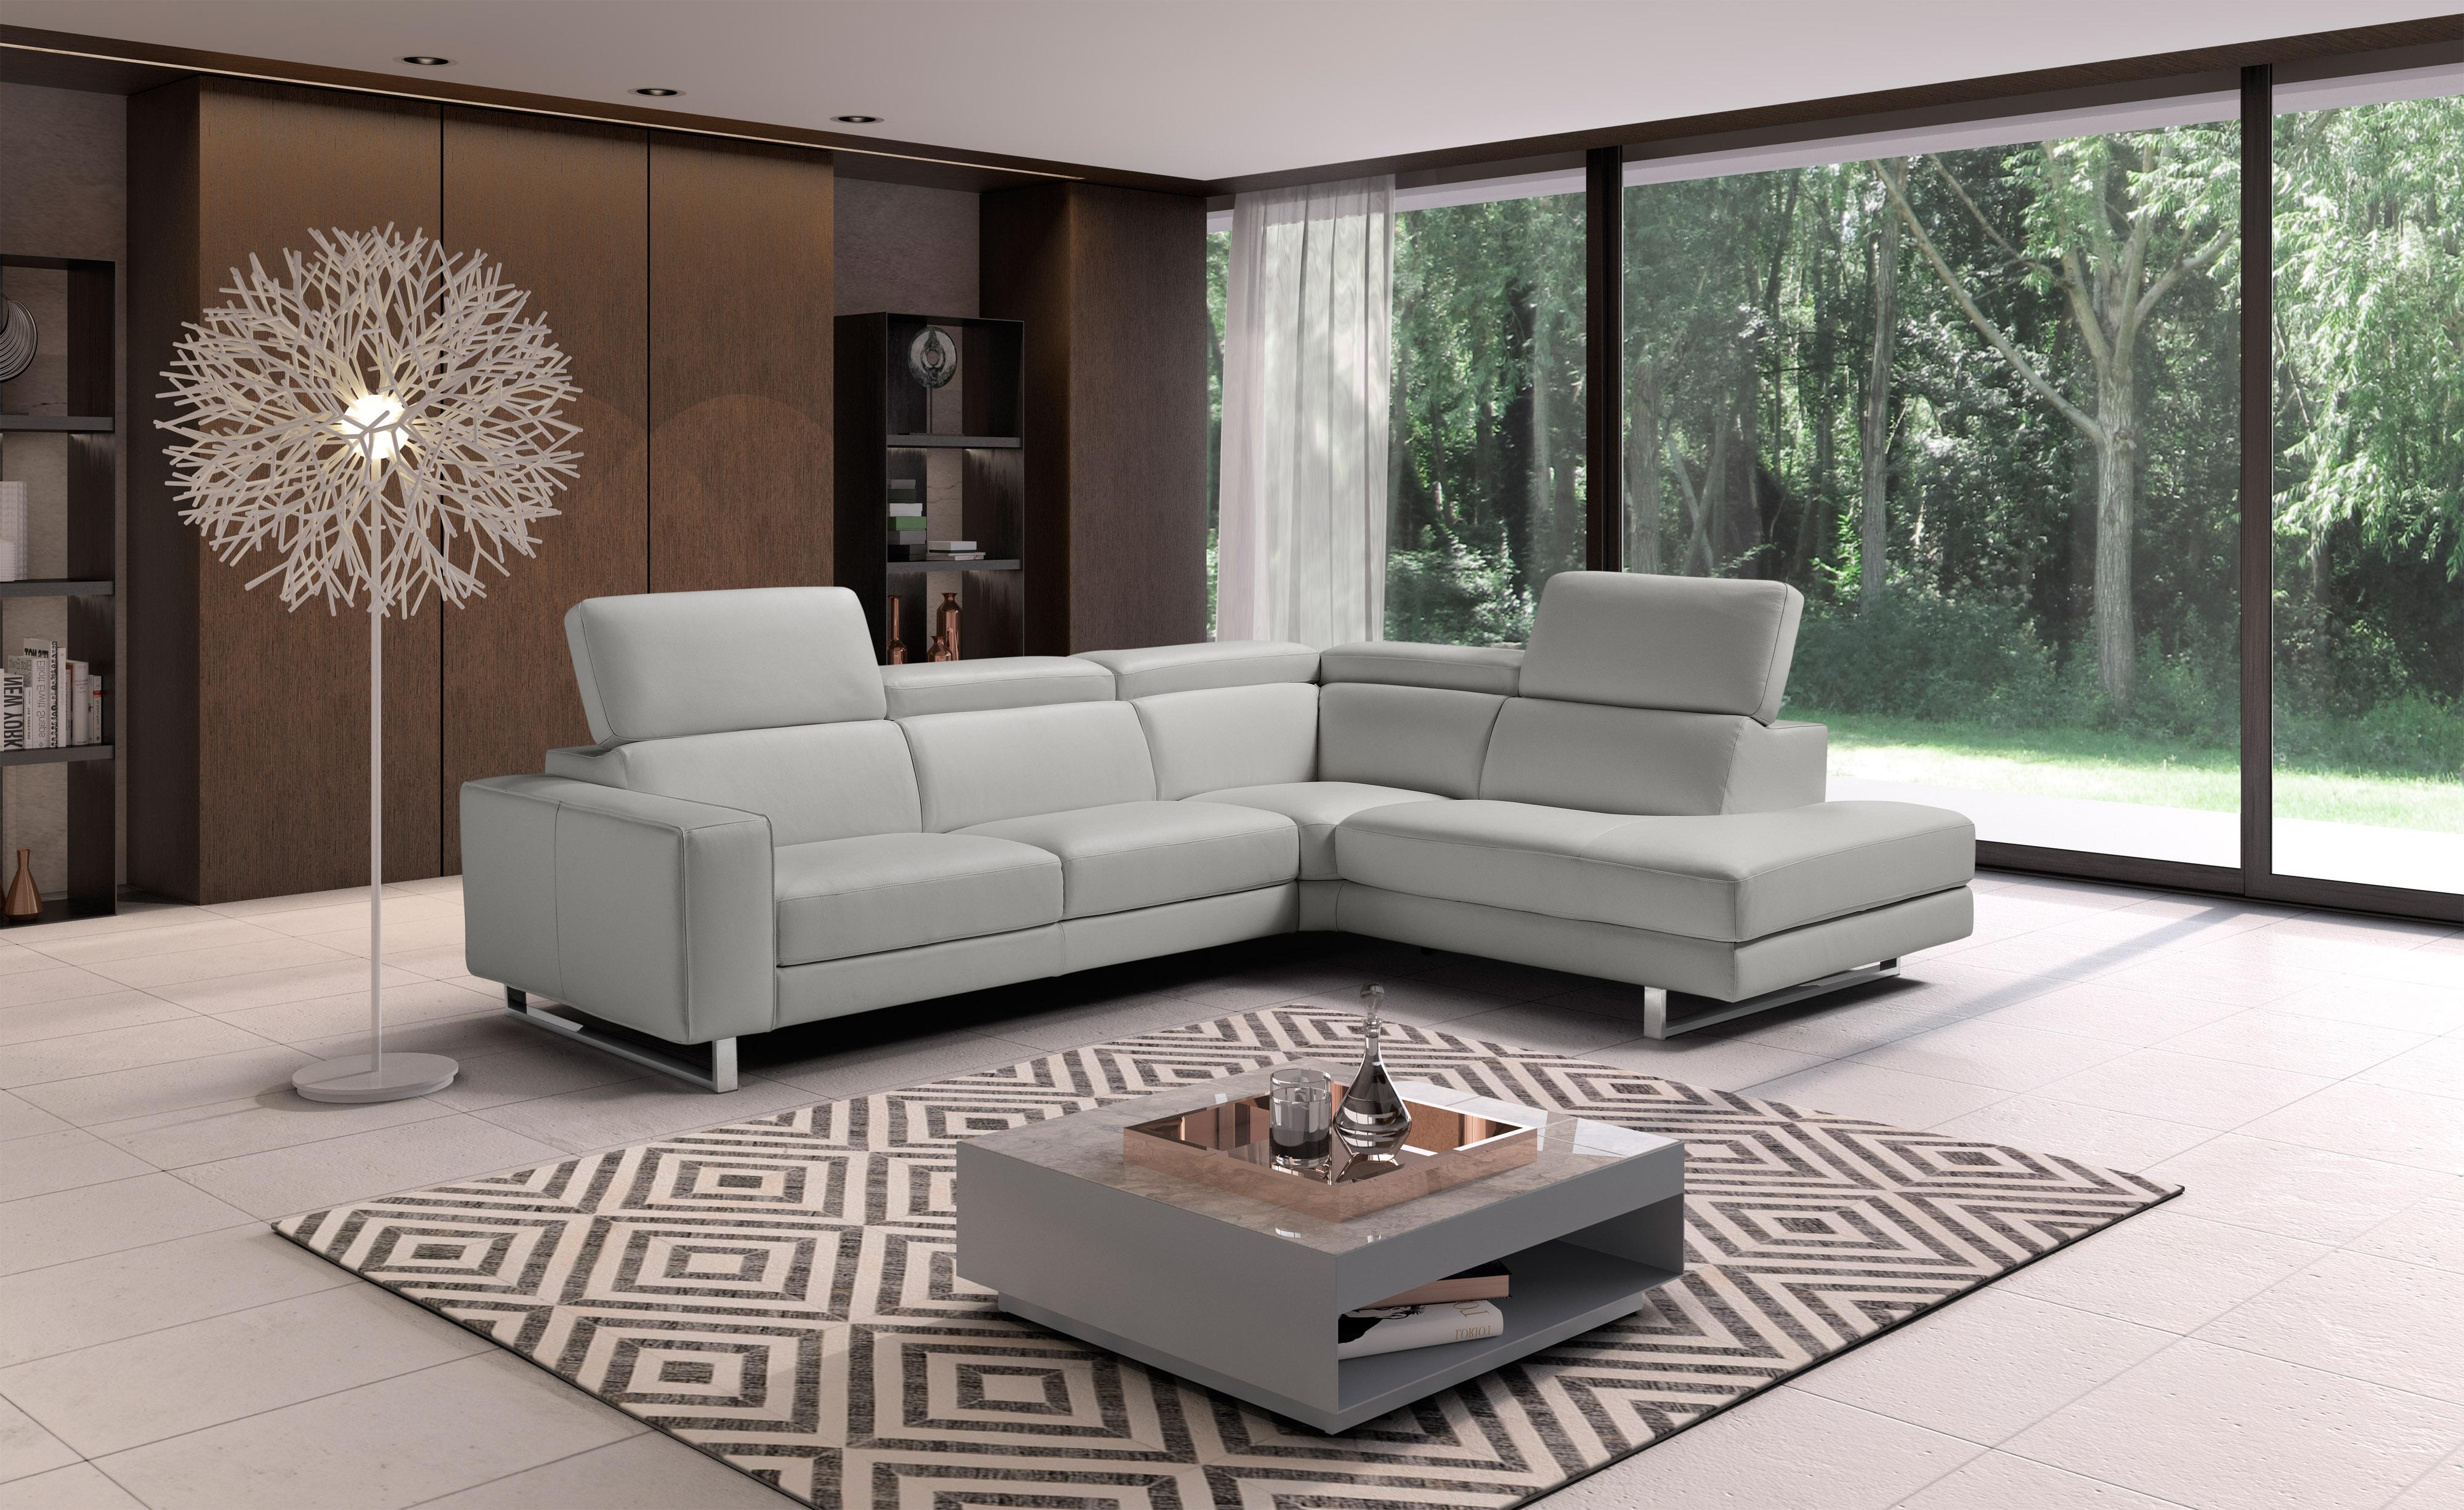 Adjustable Advanced Leather Upholstery Corner L-shape Sofa